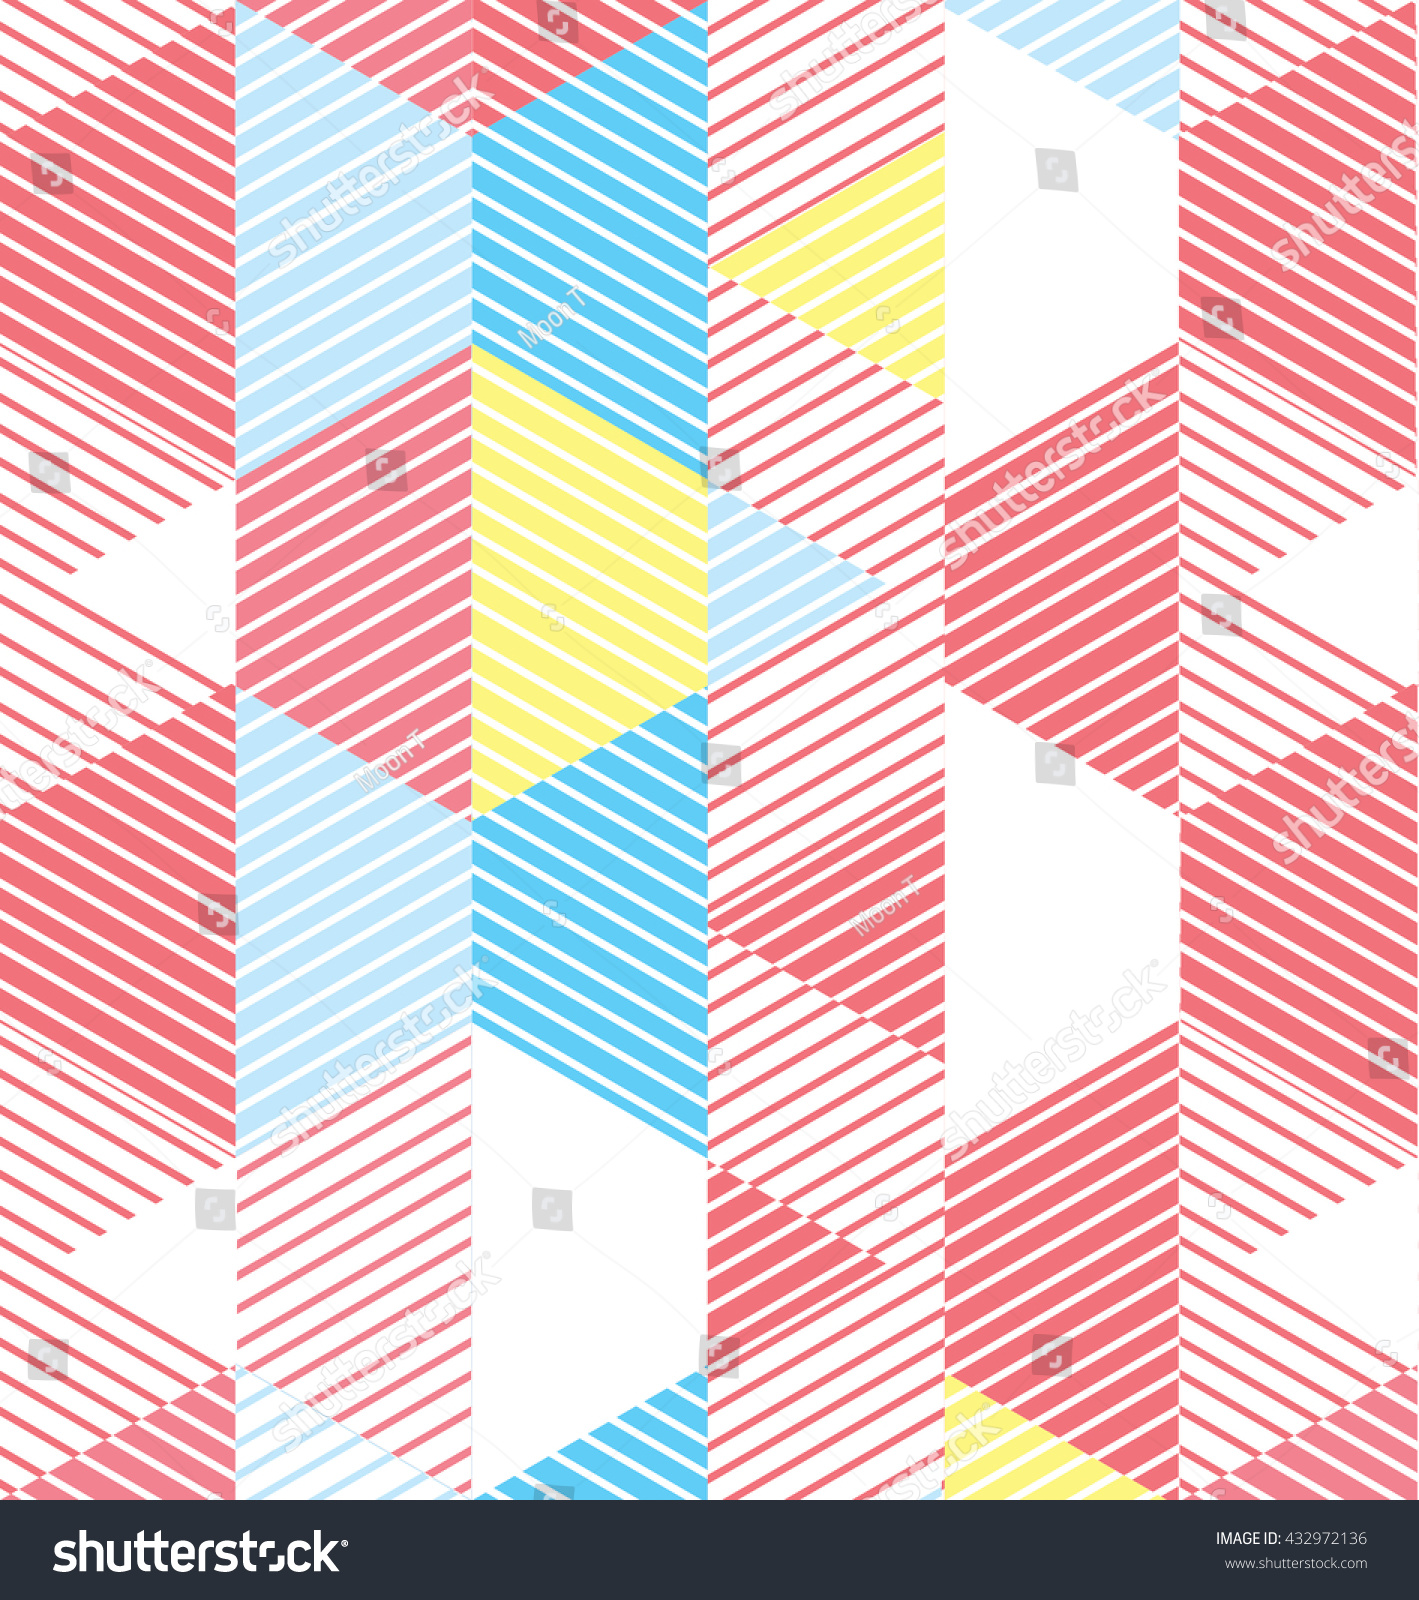 Geometric PatternGeometric VectorGeometric LinesGeometric PrintGeometric GraphicWallpaper